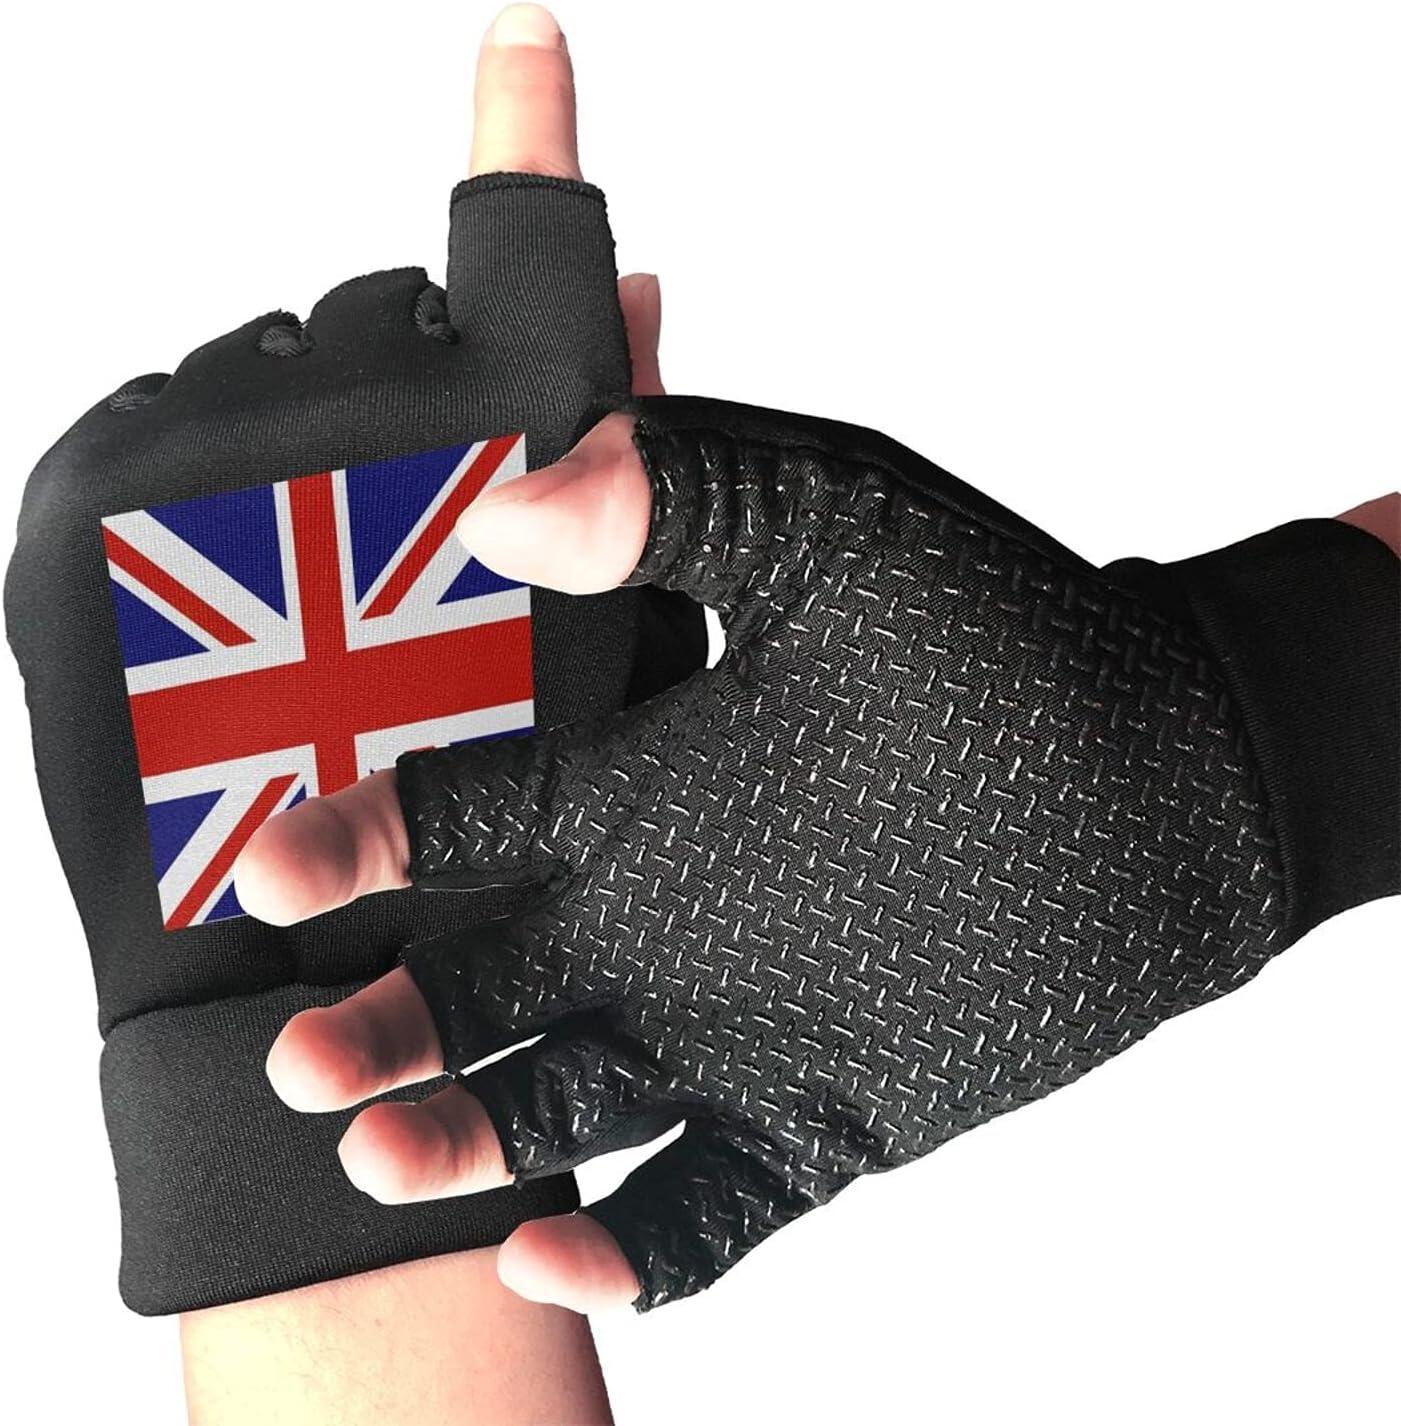 Vintage Union Jack British Unisex Finger Gloves Li Half Challenge the lowest price of Japan 4 years warranty Non-Slip